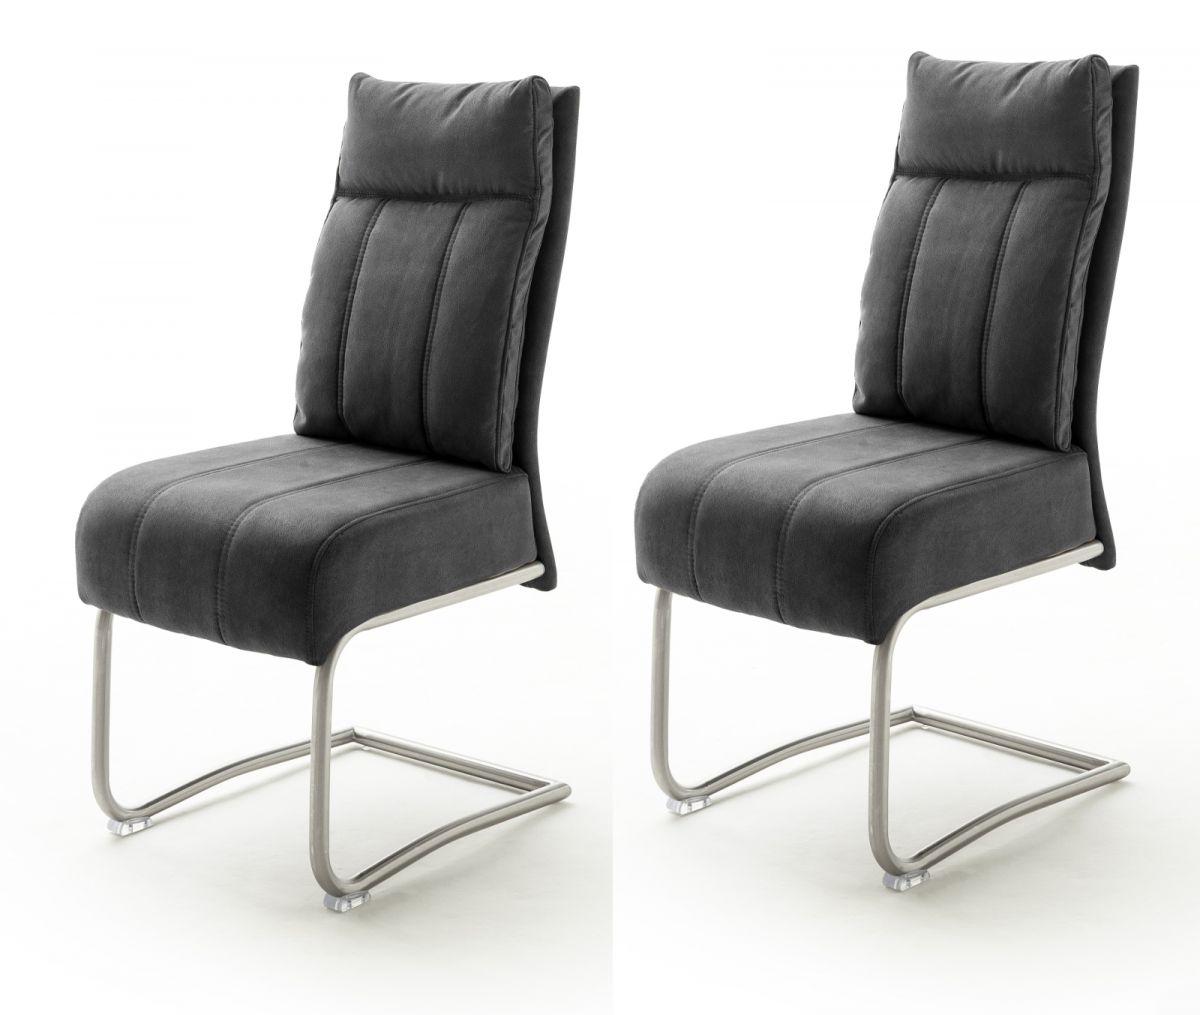 2 x Stuhl Azul dunkelgrau Antik Freischwinger Edelstahl